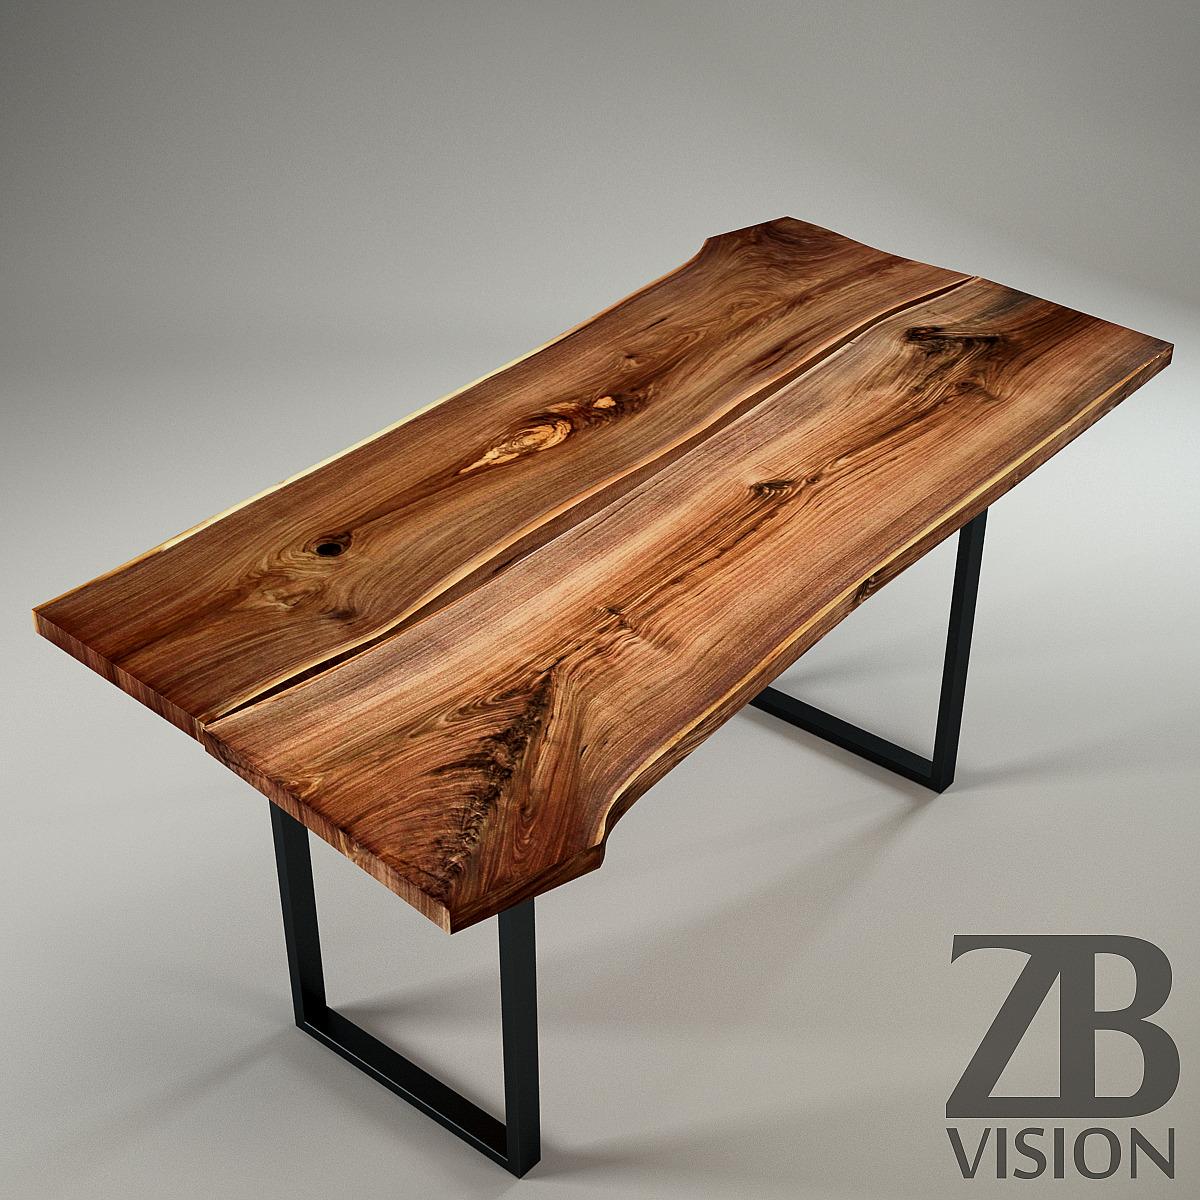 wood slab table by ign design switzerland